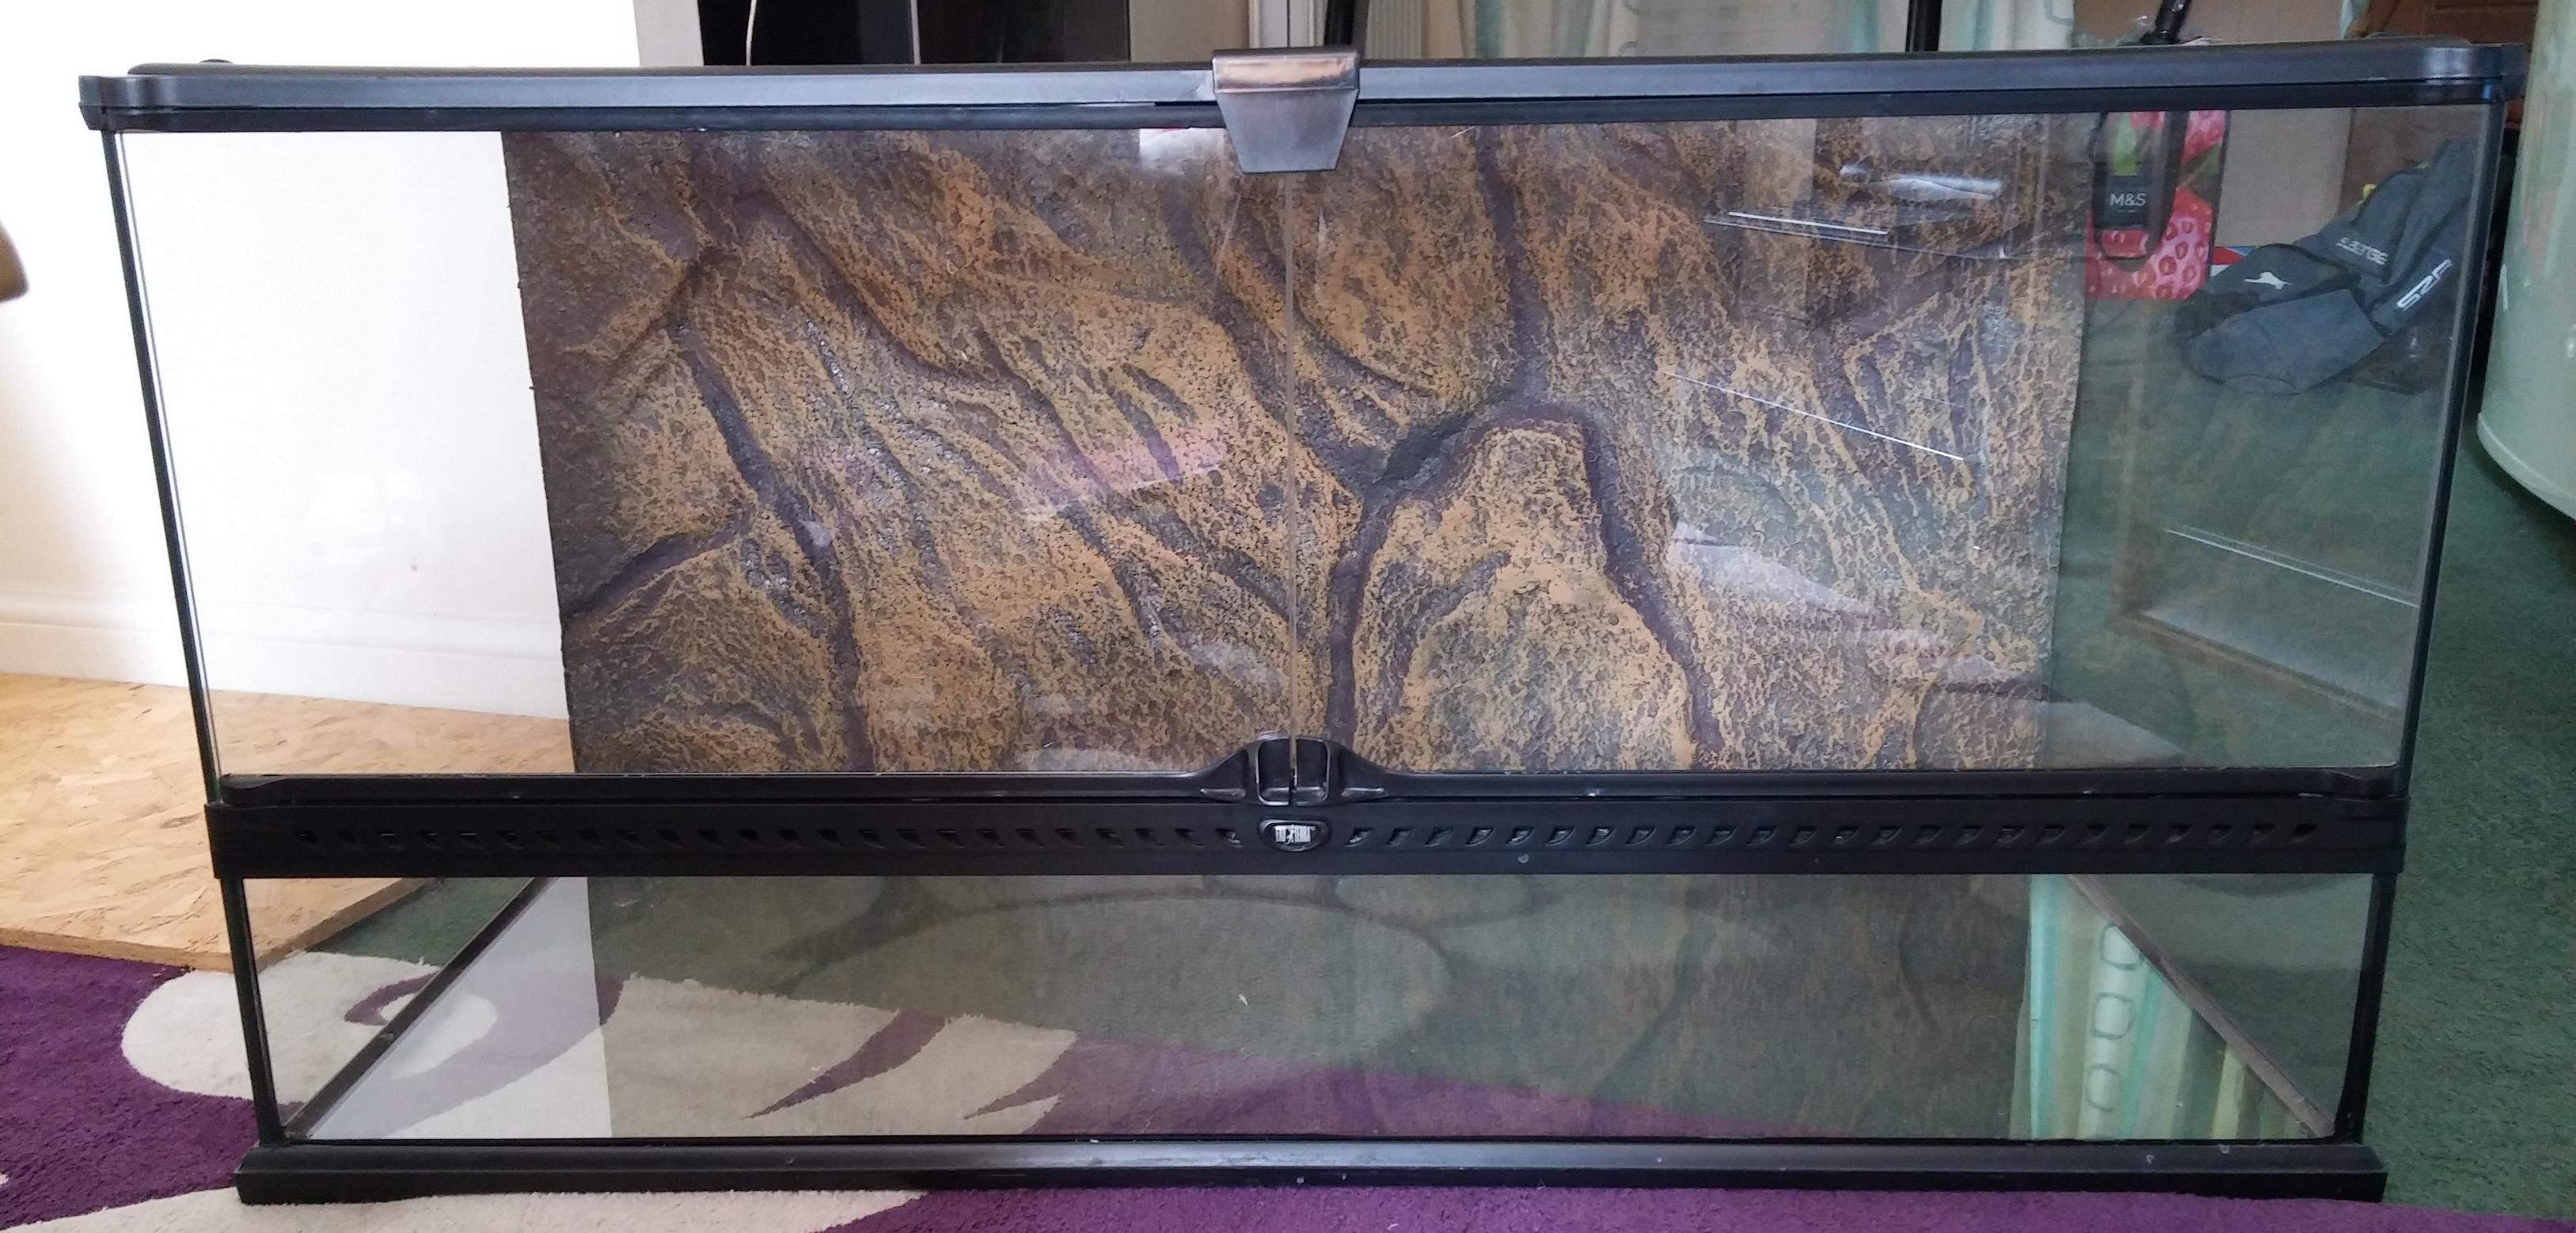 Exo Terra Glass Terrarium 90x45x45cm in extremely good condition-exo-terra-1.jpg